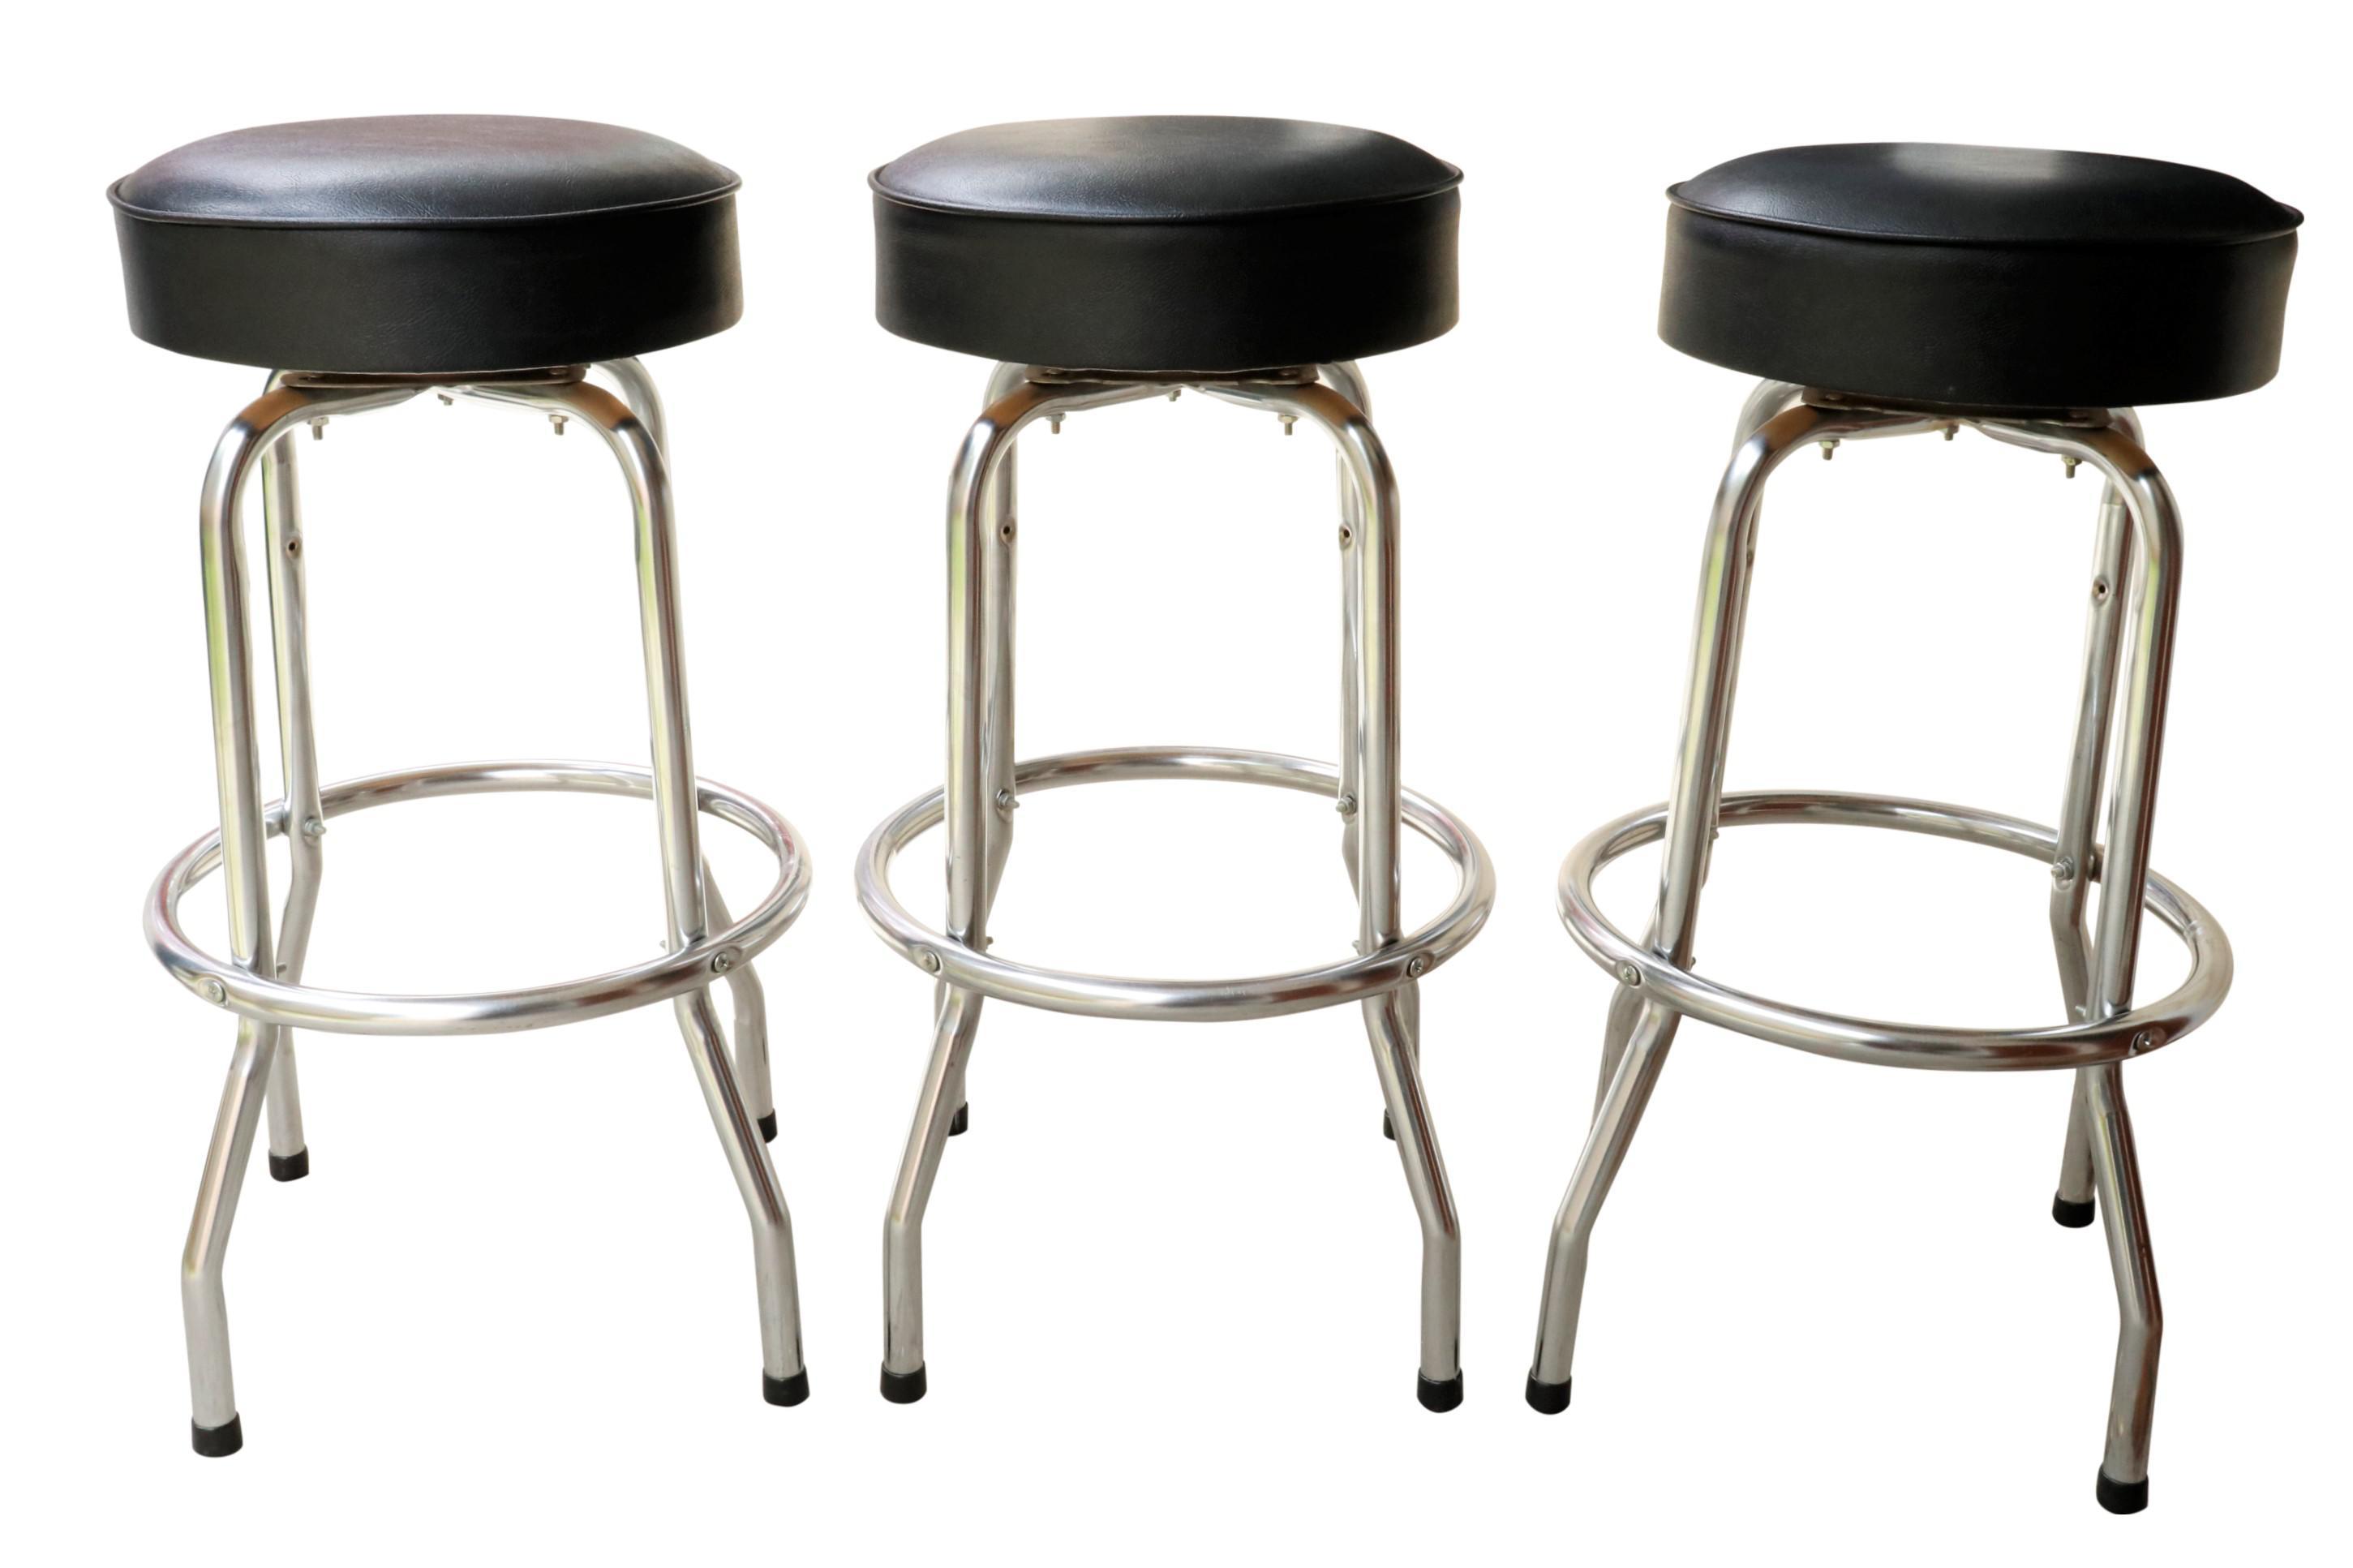 Image of: Mid Century Modern Bar Stools Set Of 3 Chairish